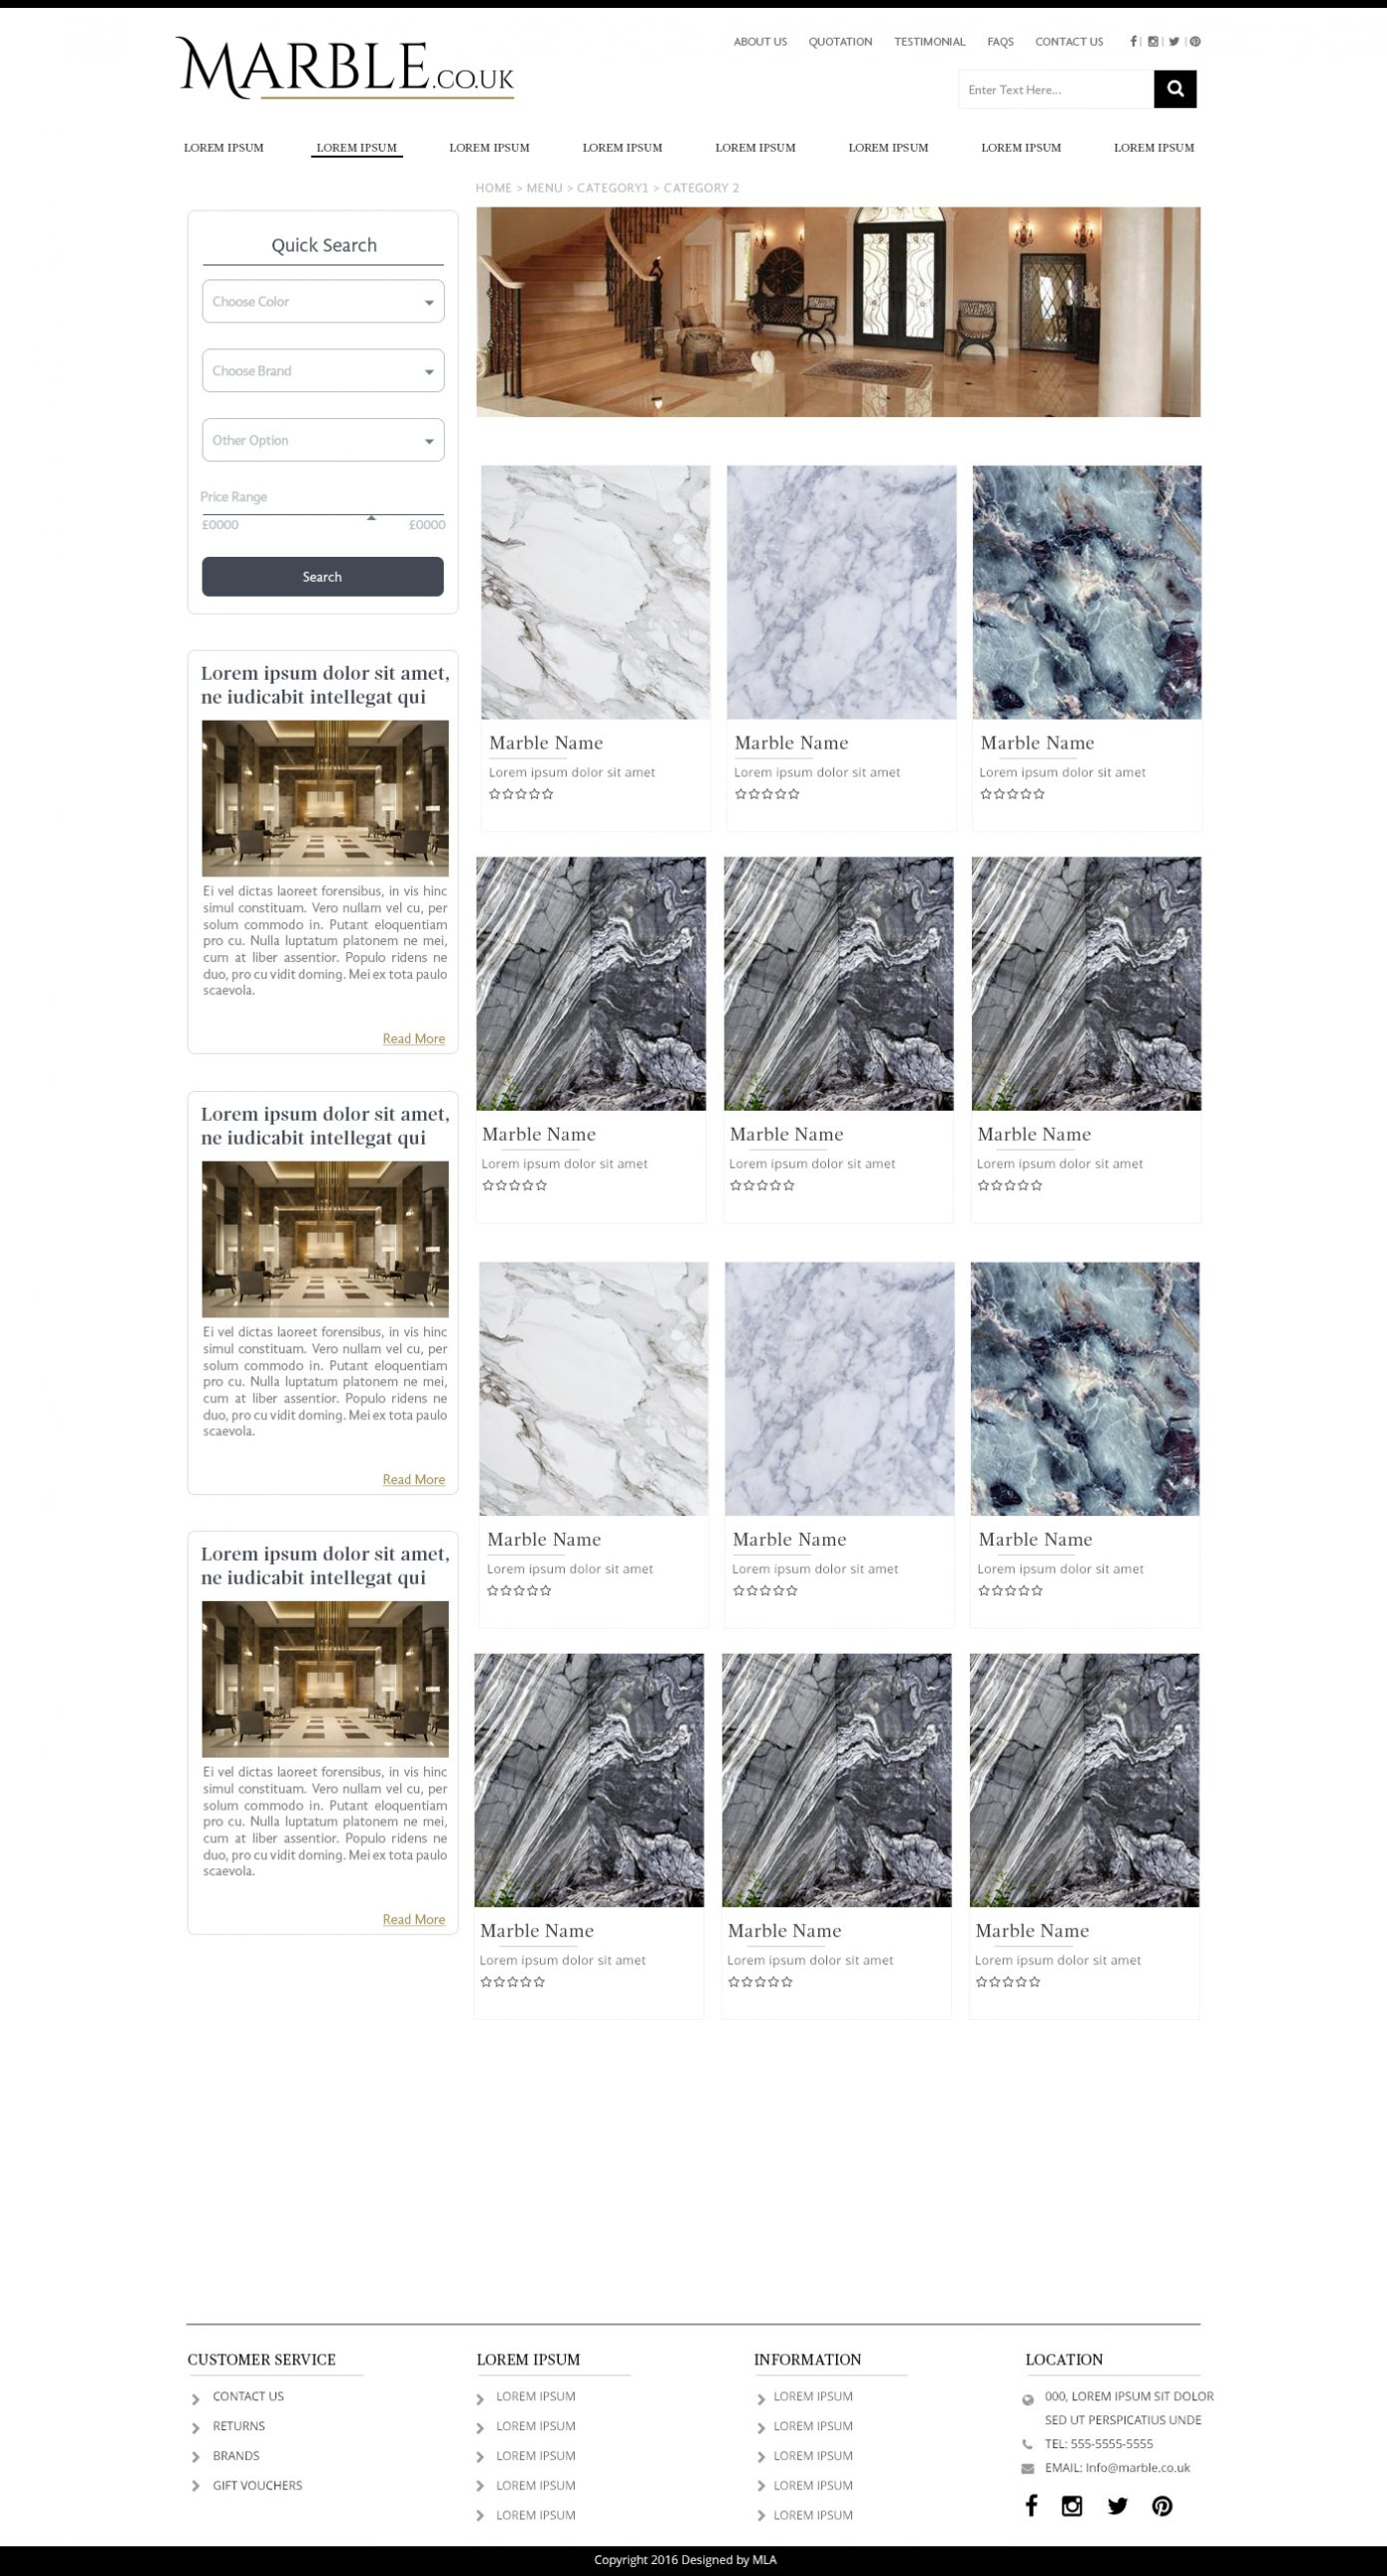 MarbleCoUk category page design - Website design London - web design agency london